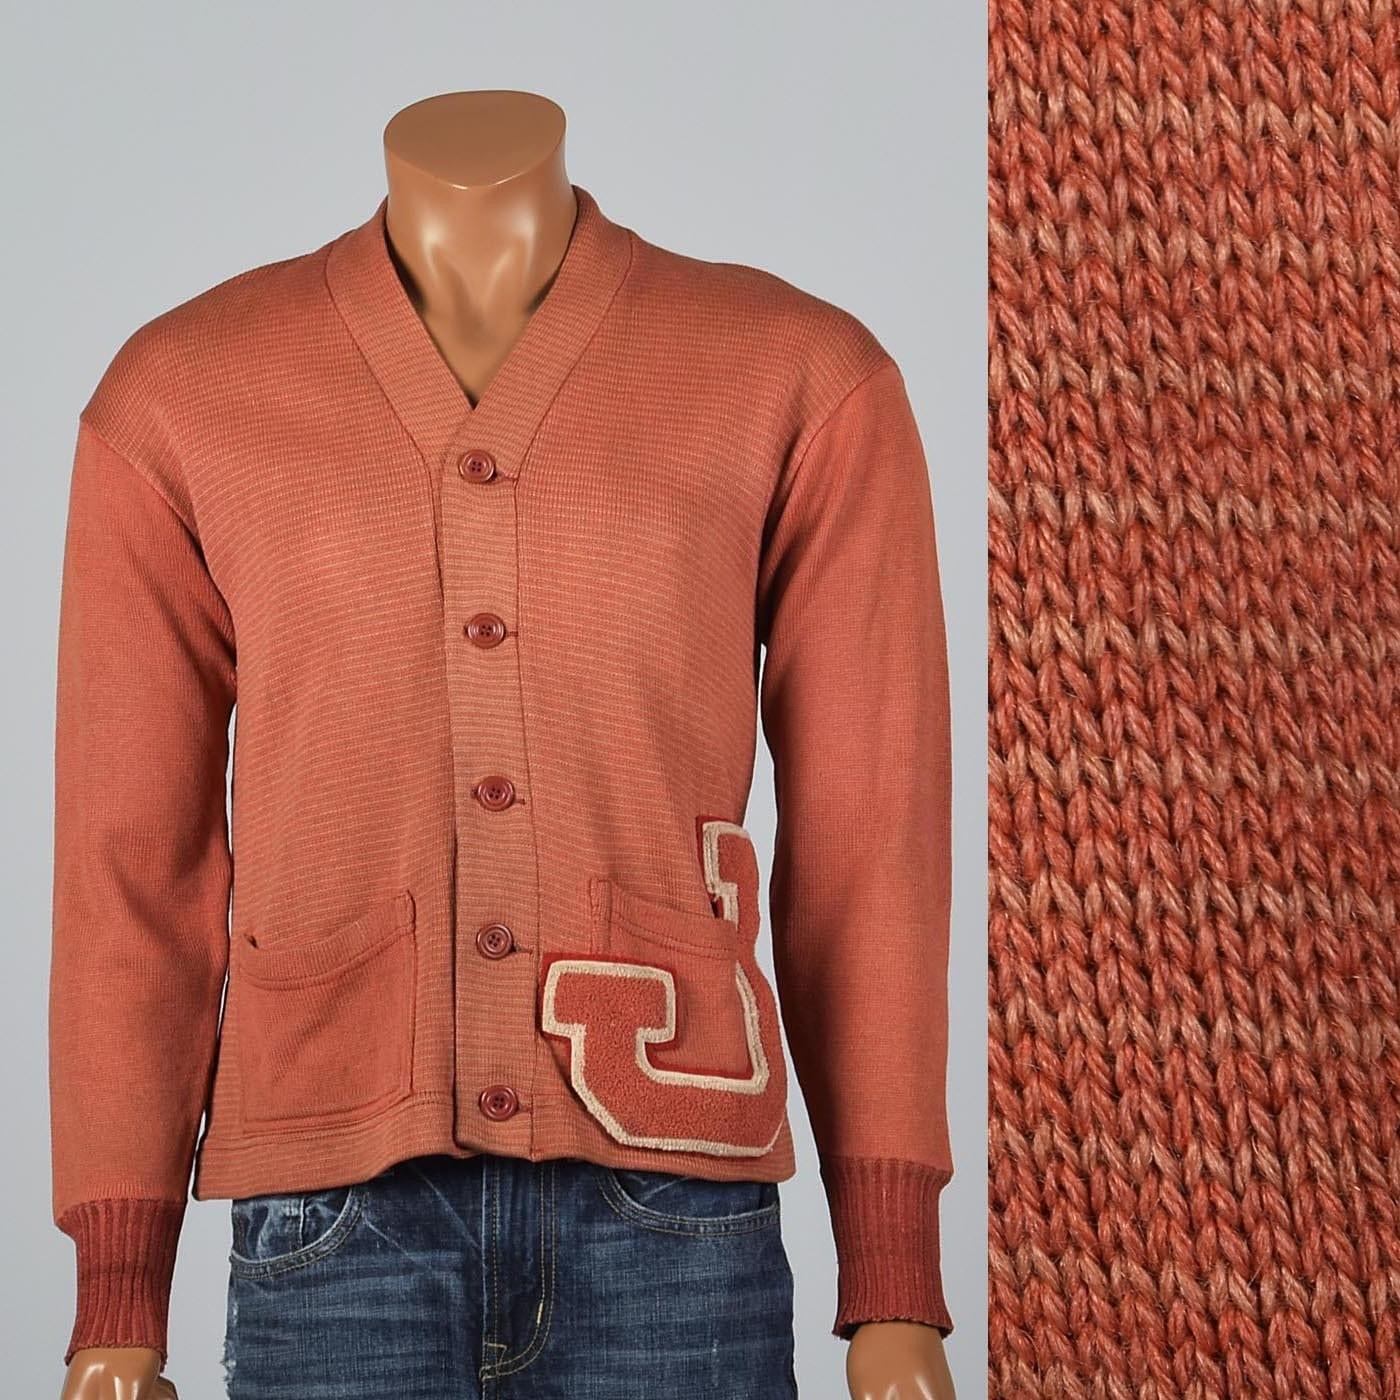 New 1930s Mens Fashion Ties Medium 1930S Cardigan Sweater 30S Letterman Wool Knit J Patch University Campus Athletic Preppy Vintage Man Mens Ivy League $0.00 AT vintagedancer.com